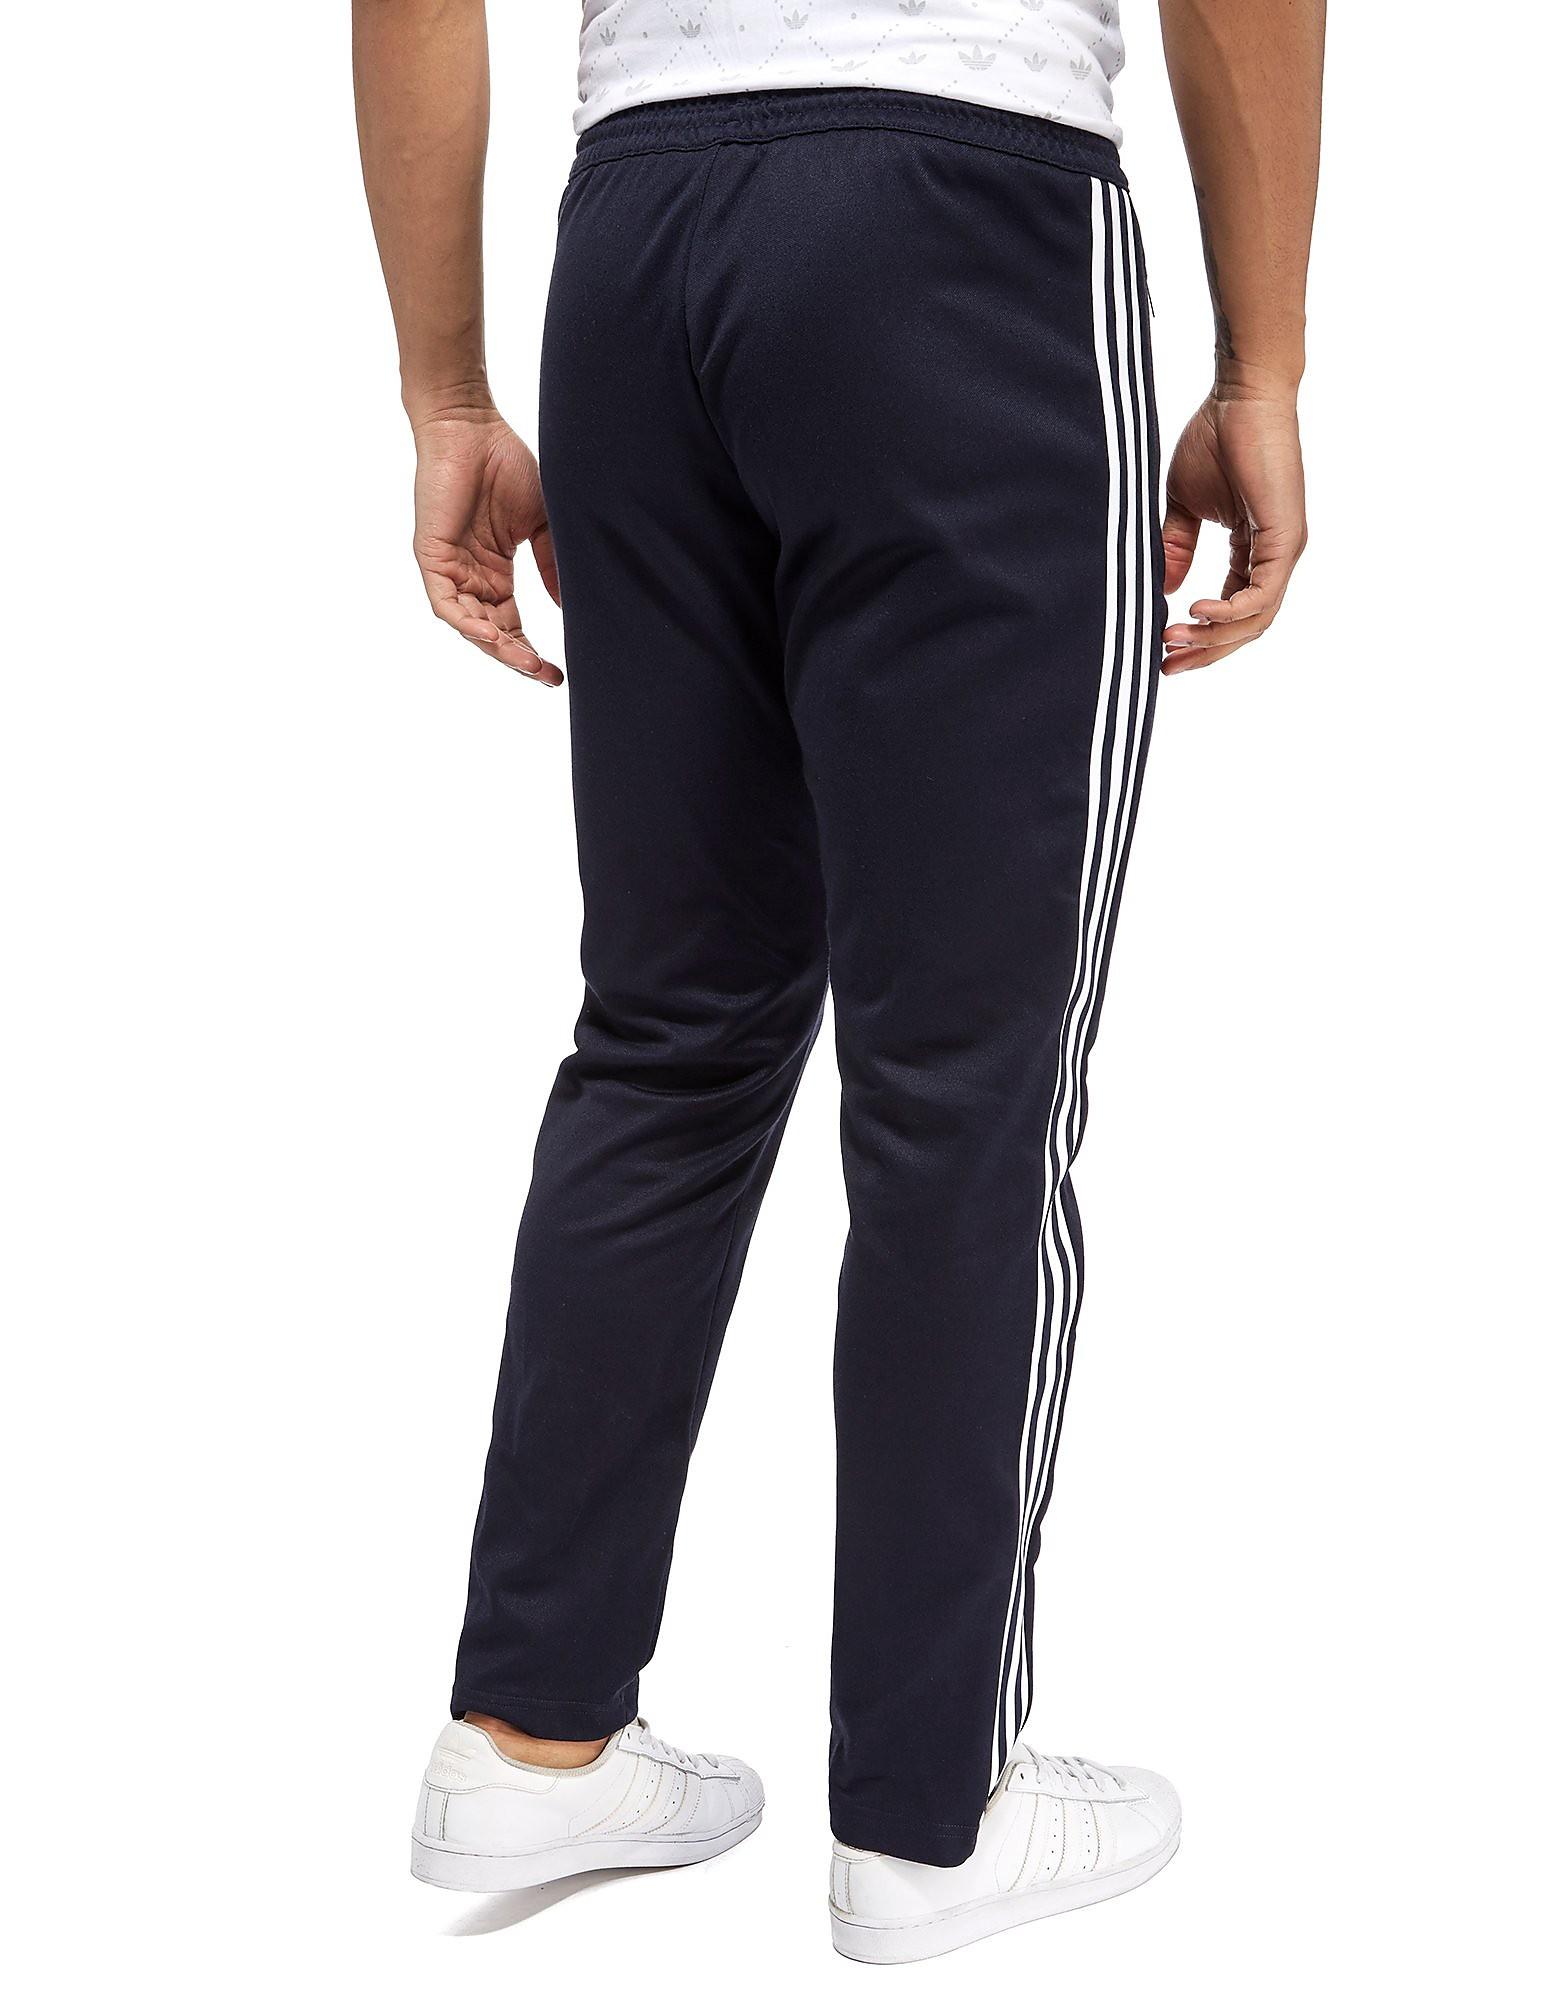 adidas Originals Trefoil Tapered Track Pants